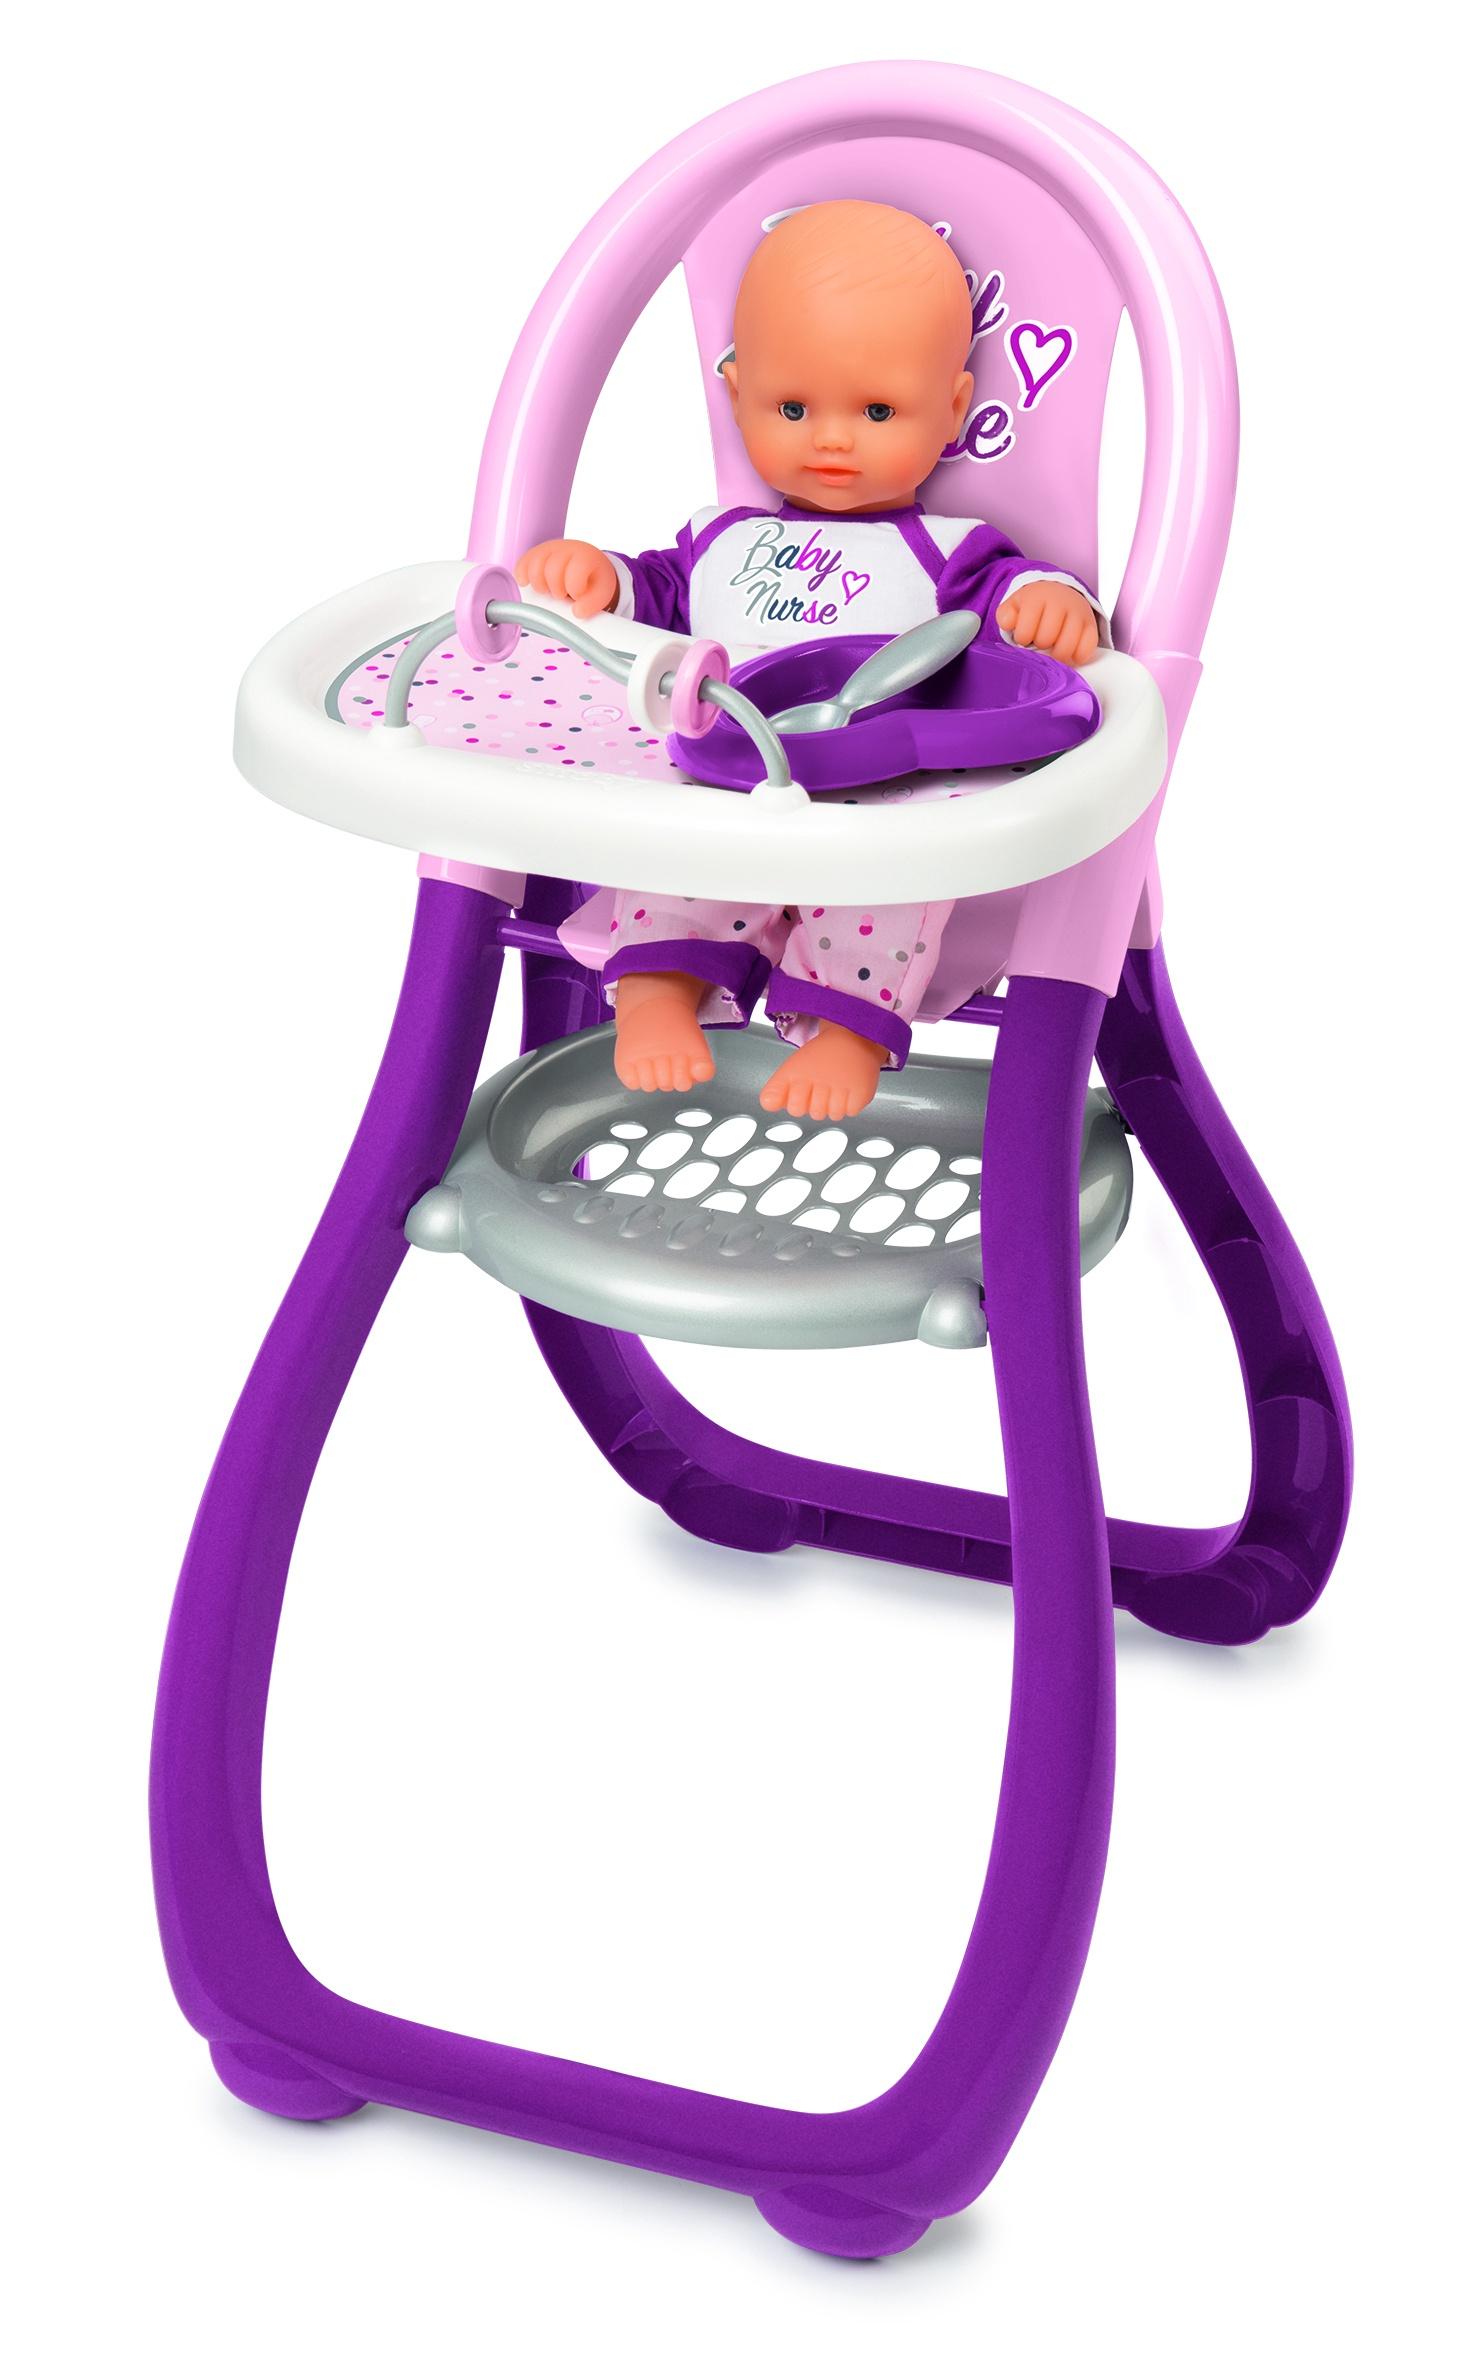 Baby Nurse Стульчик для кормления пупса, 33х46х65 см